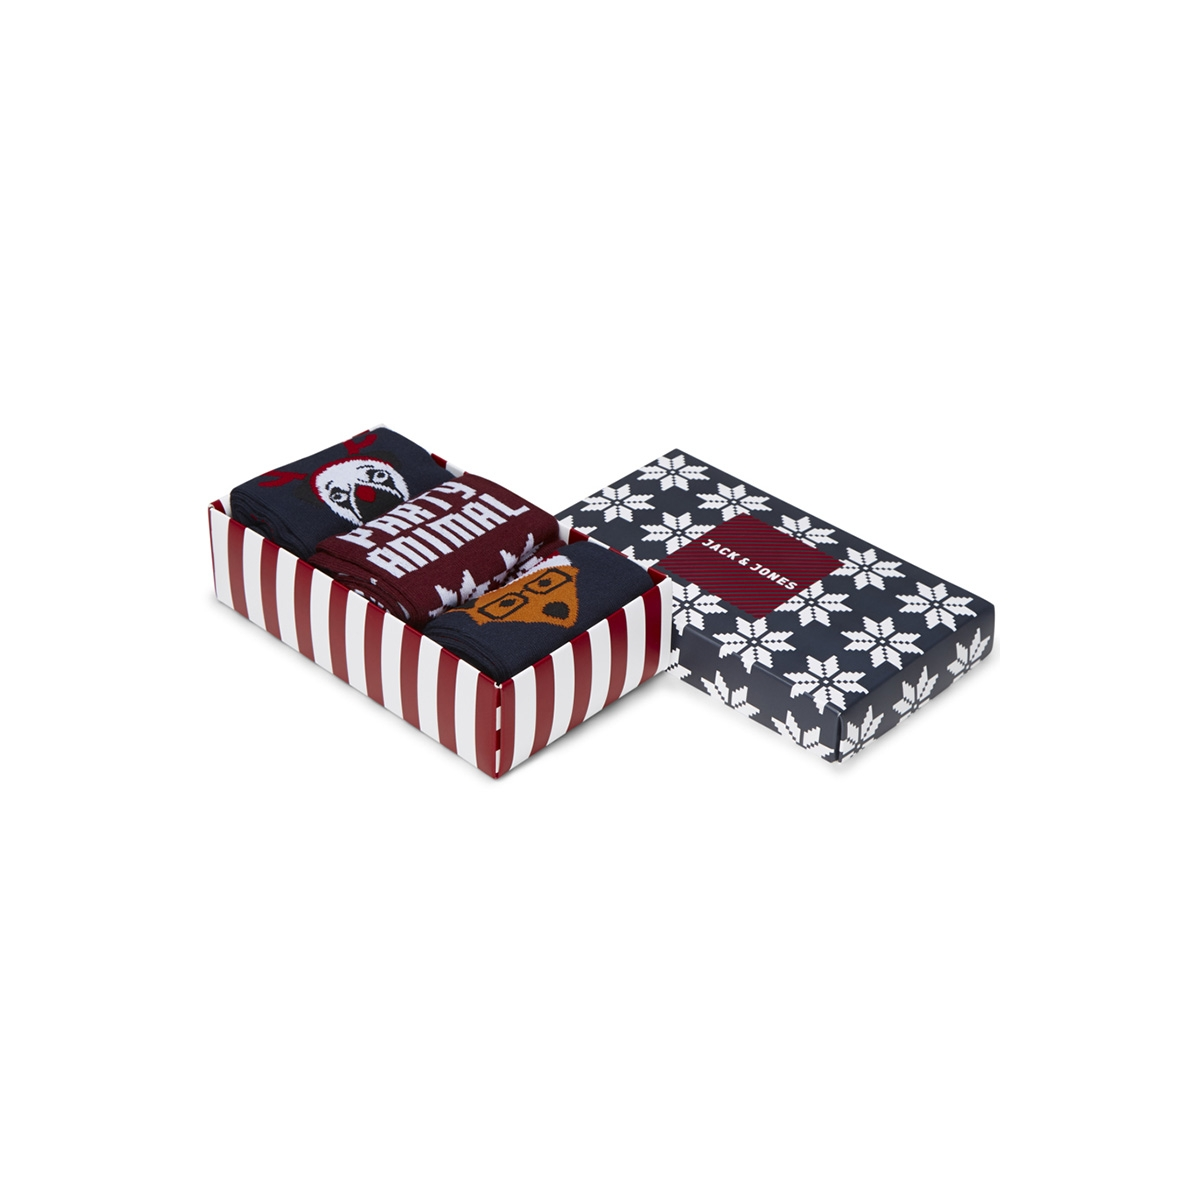 jacparty christmas socks giftbox 12144181 jack & jones accessoire navy blazer/tango red